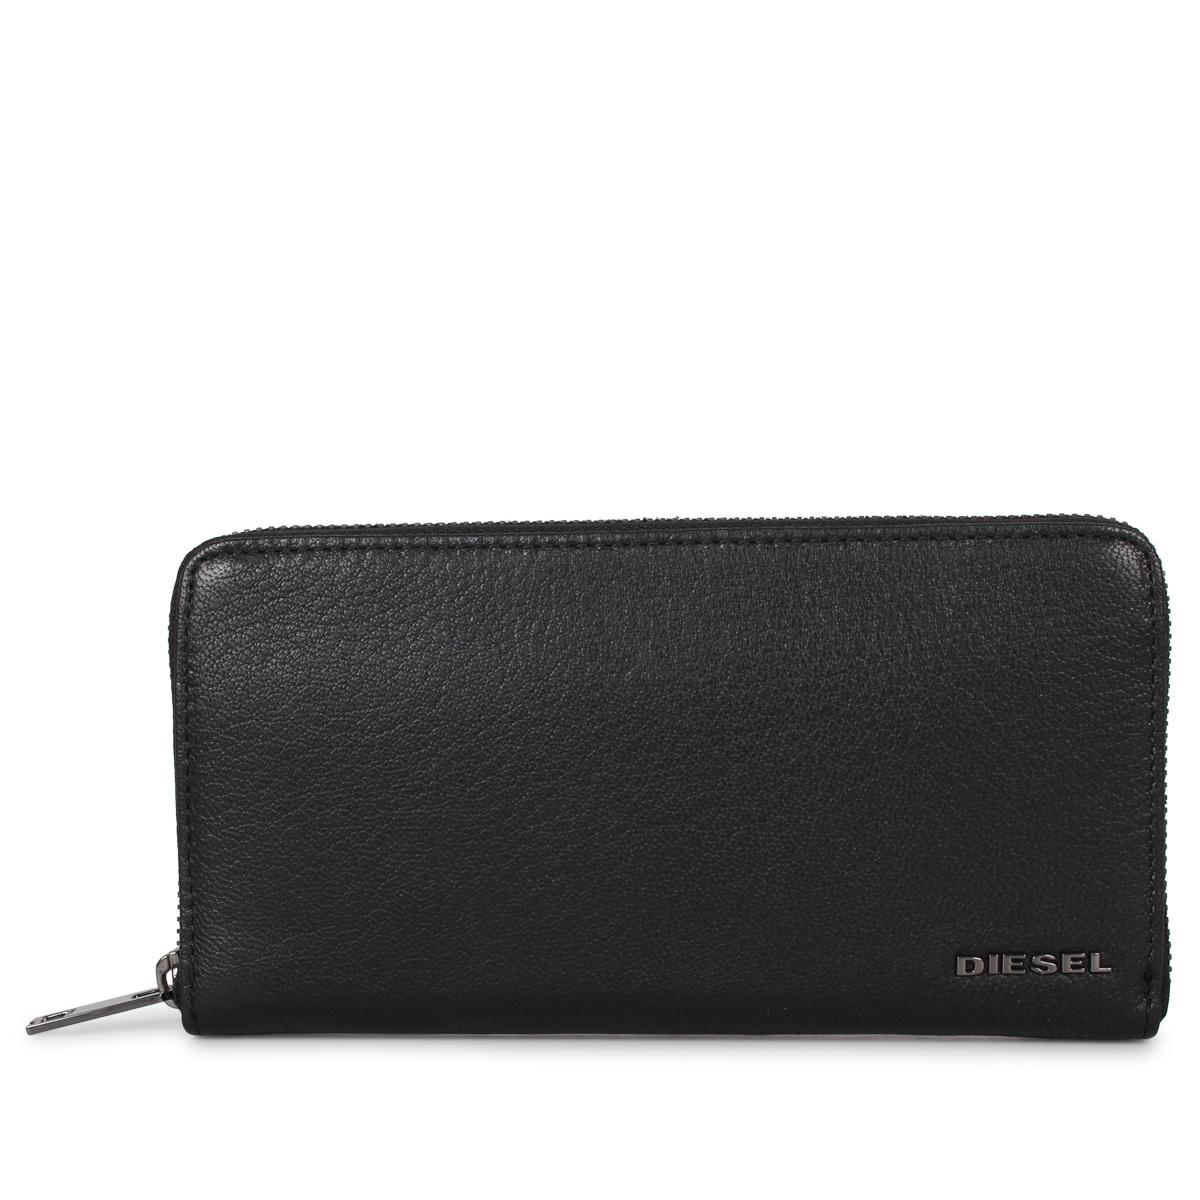 DIESEL 24 ZIP ディーゼル 財布 長財布 メンズ ブラック 黒 X06626-P0396